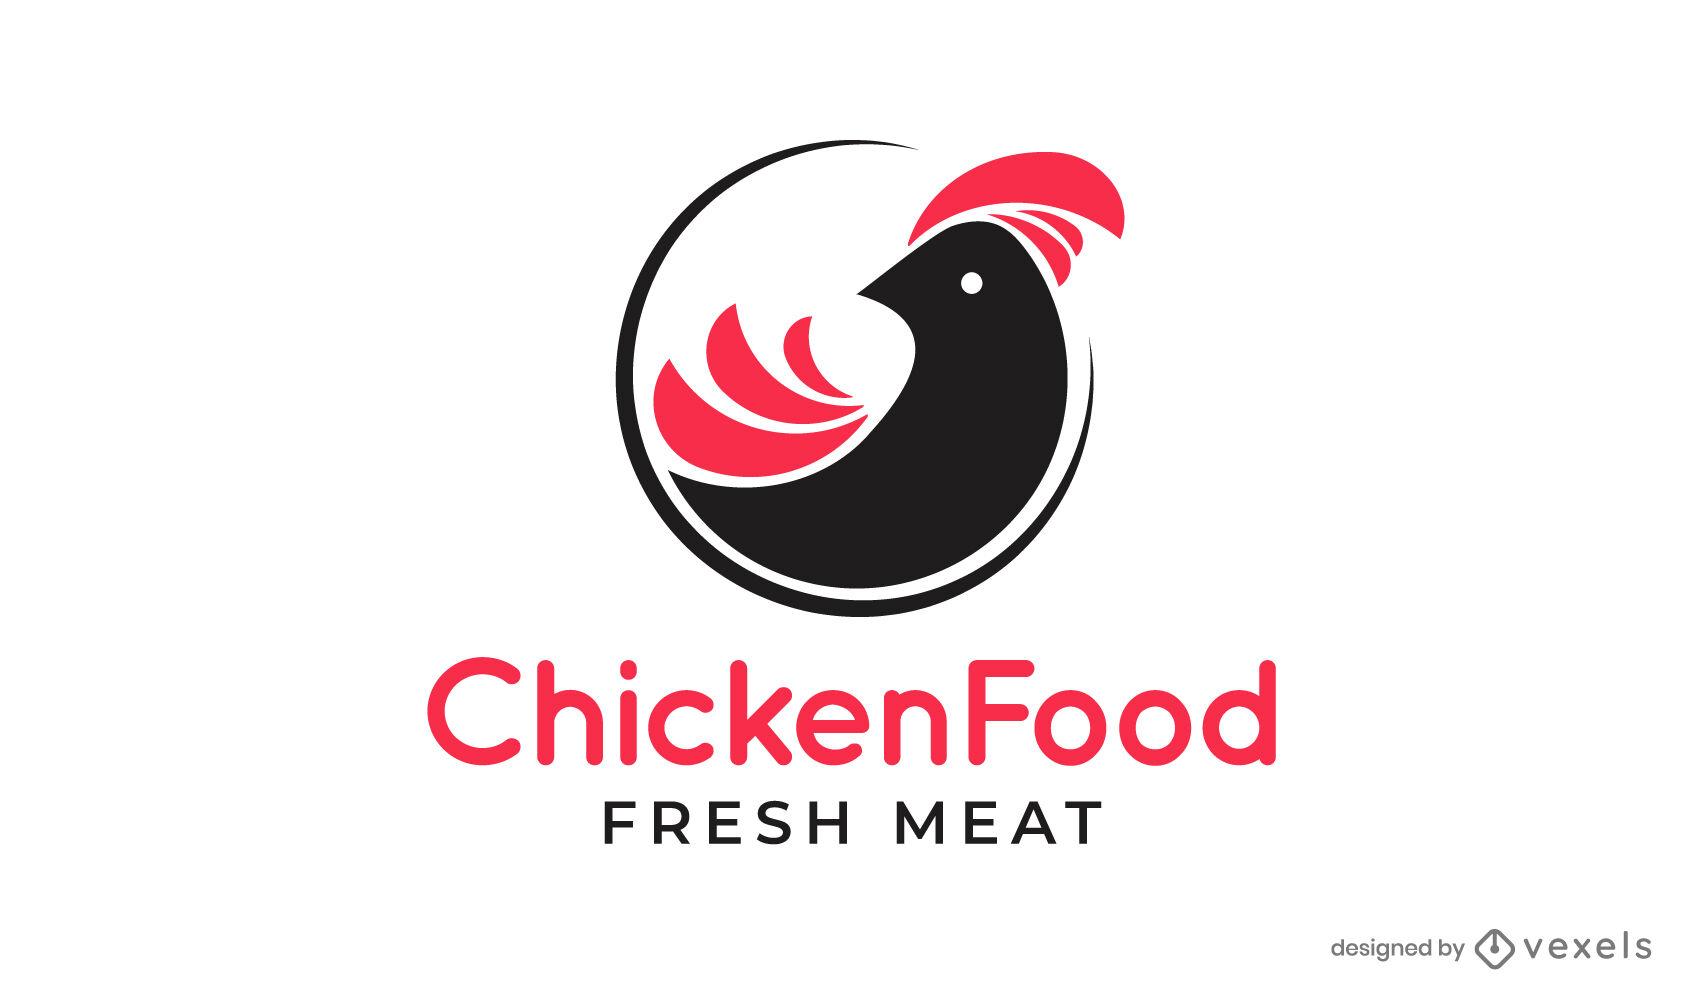 Chicken animal food cut out logo design